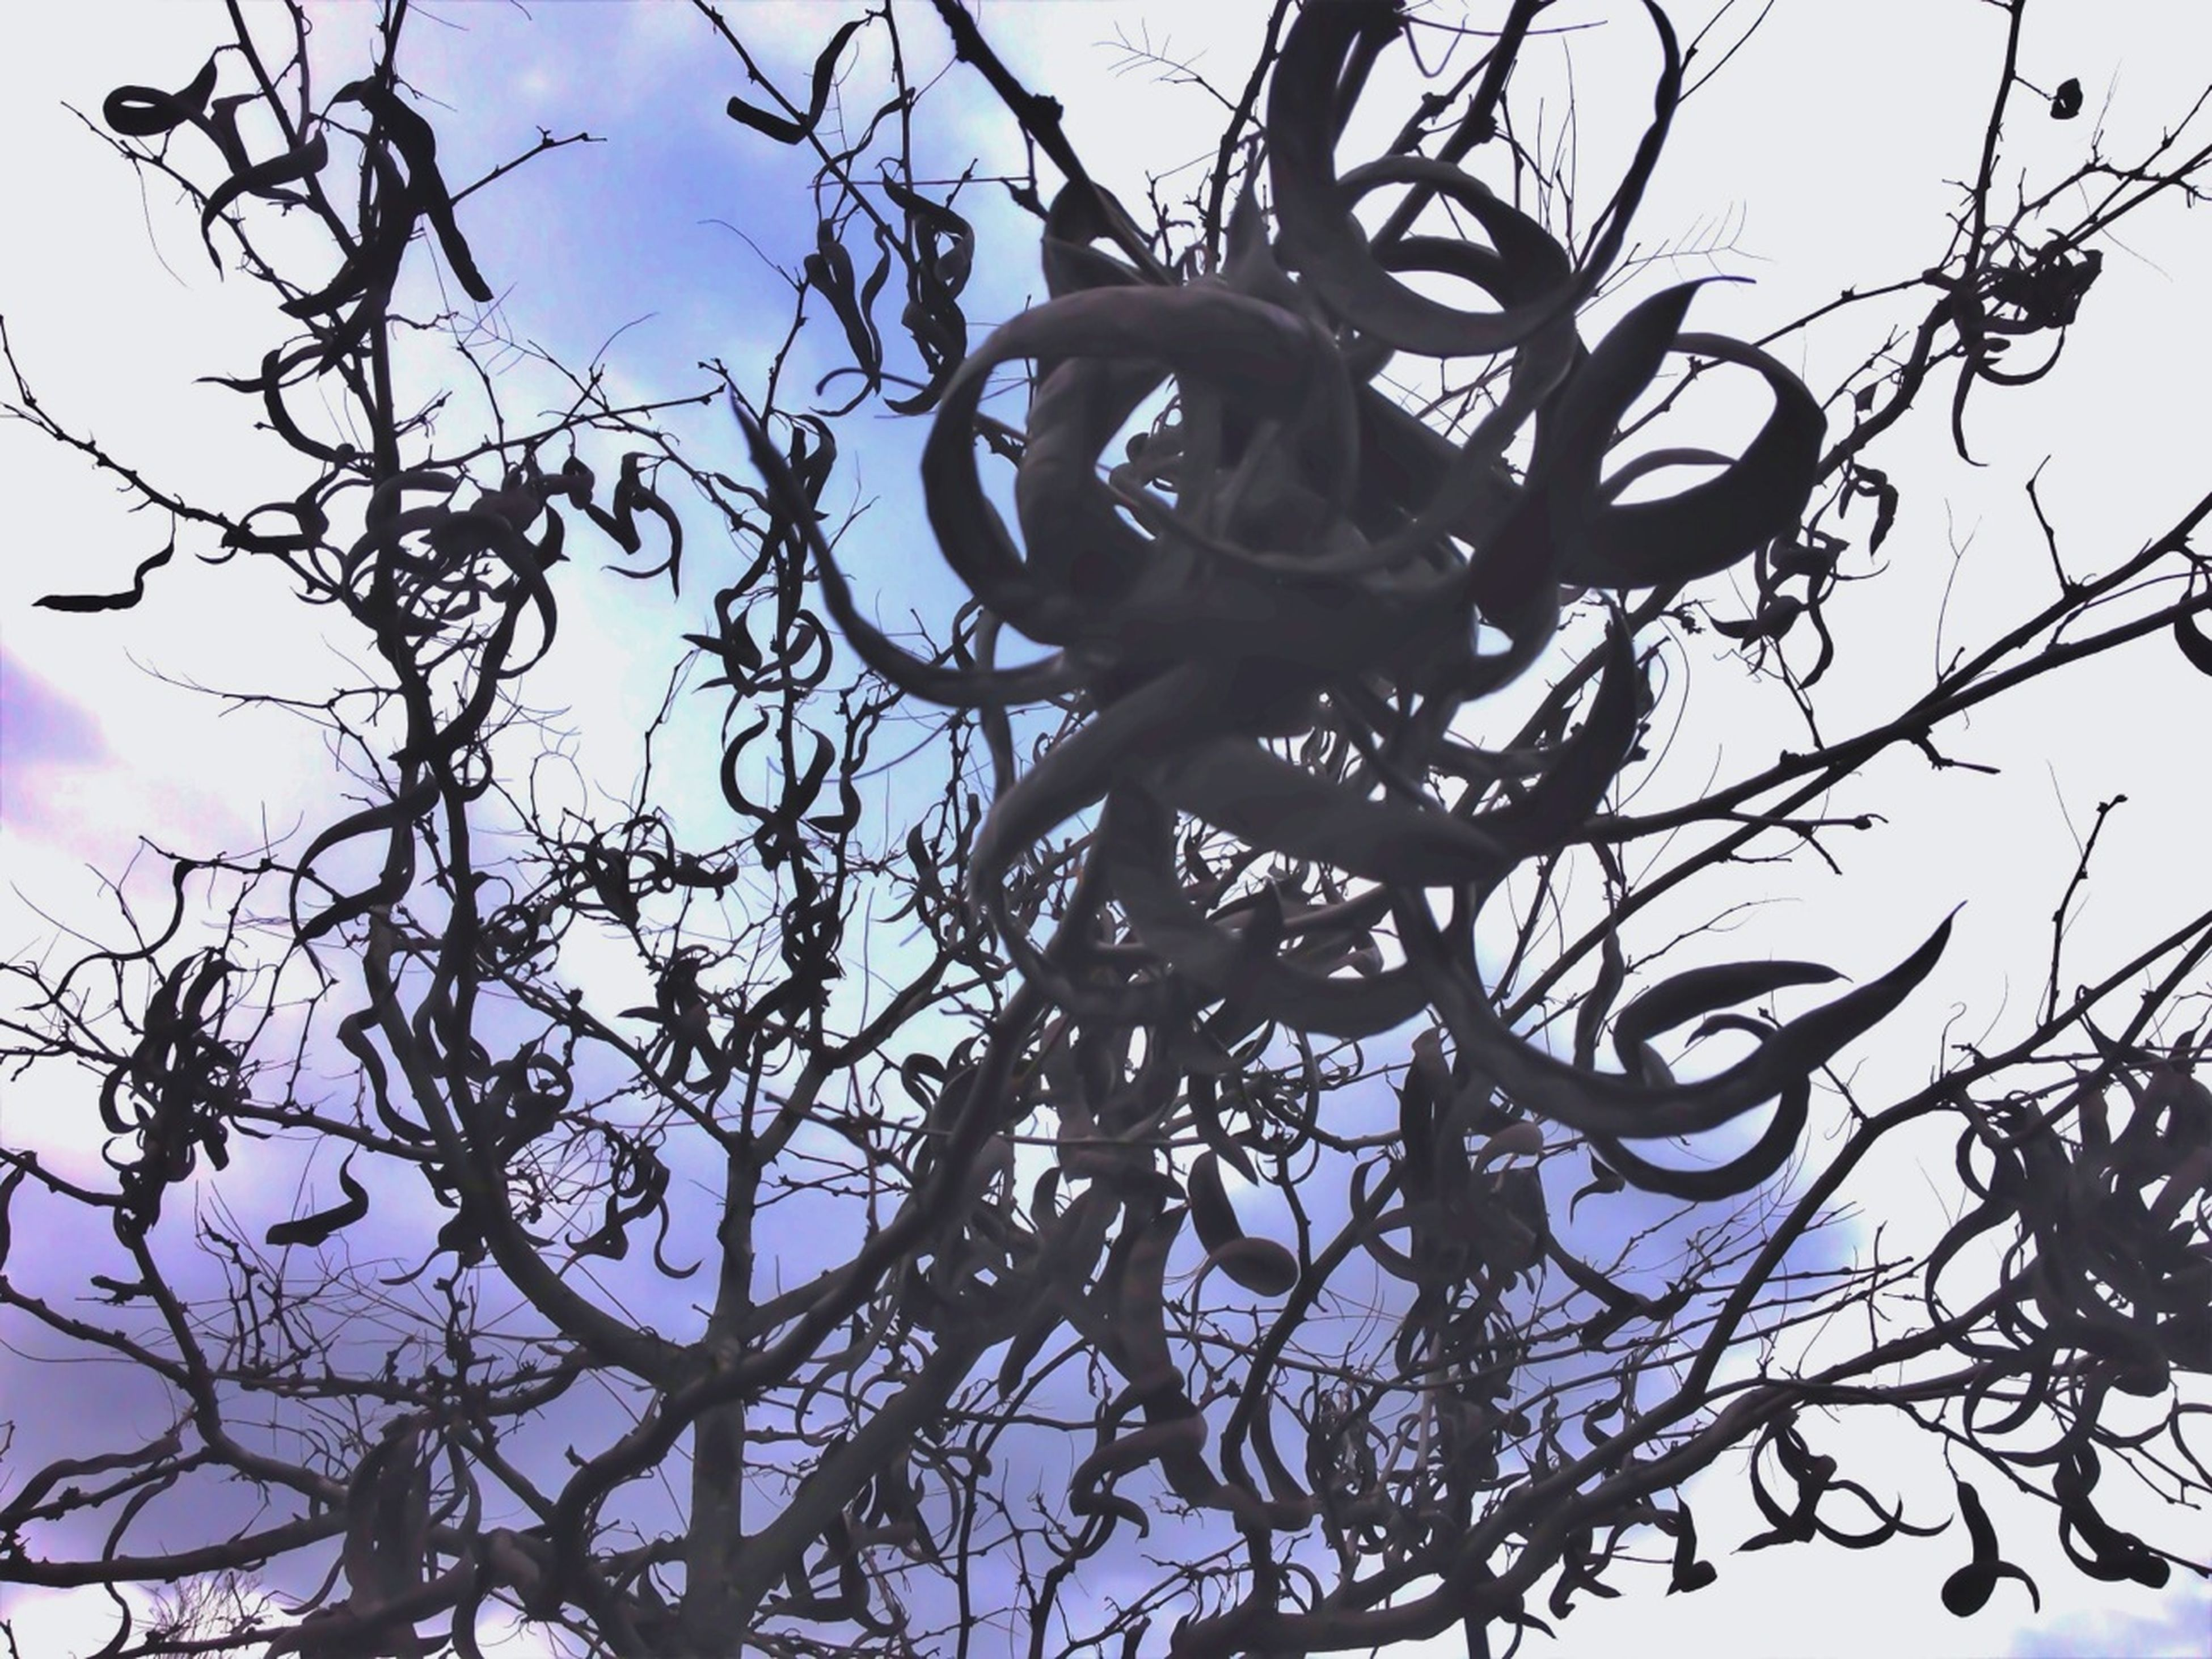 Twirling tree against a swirling sky.